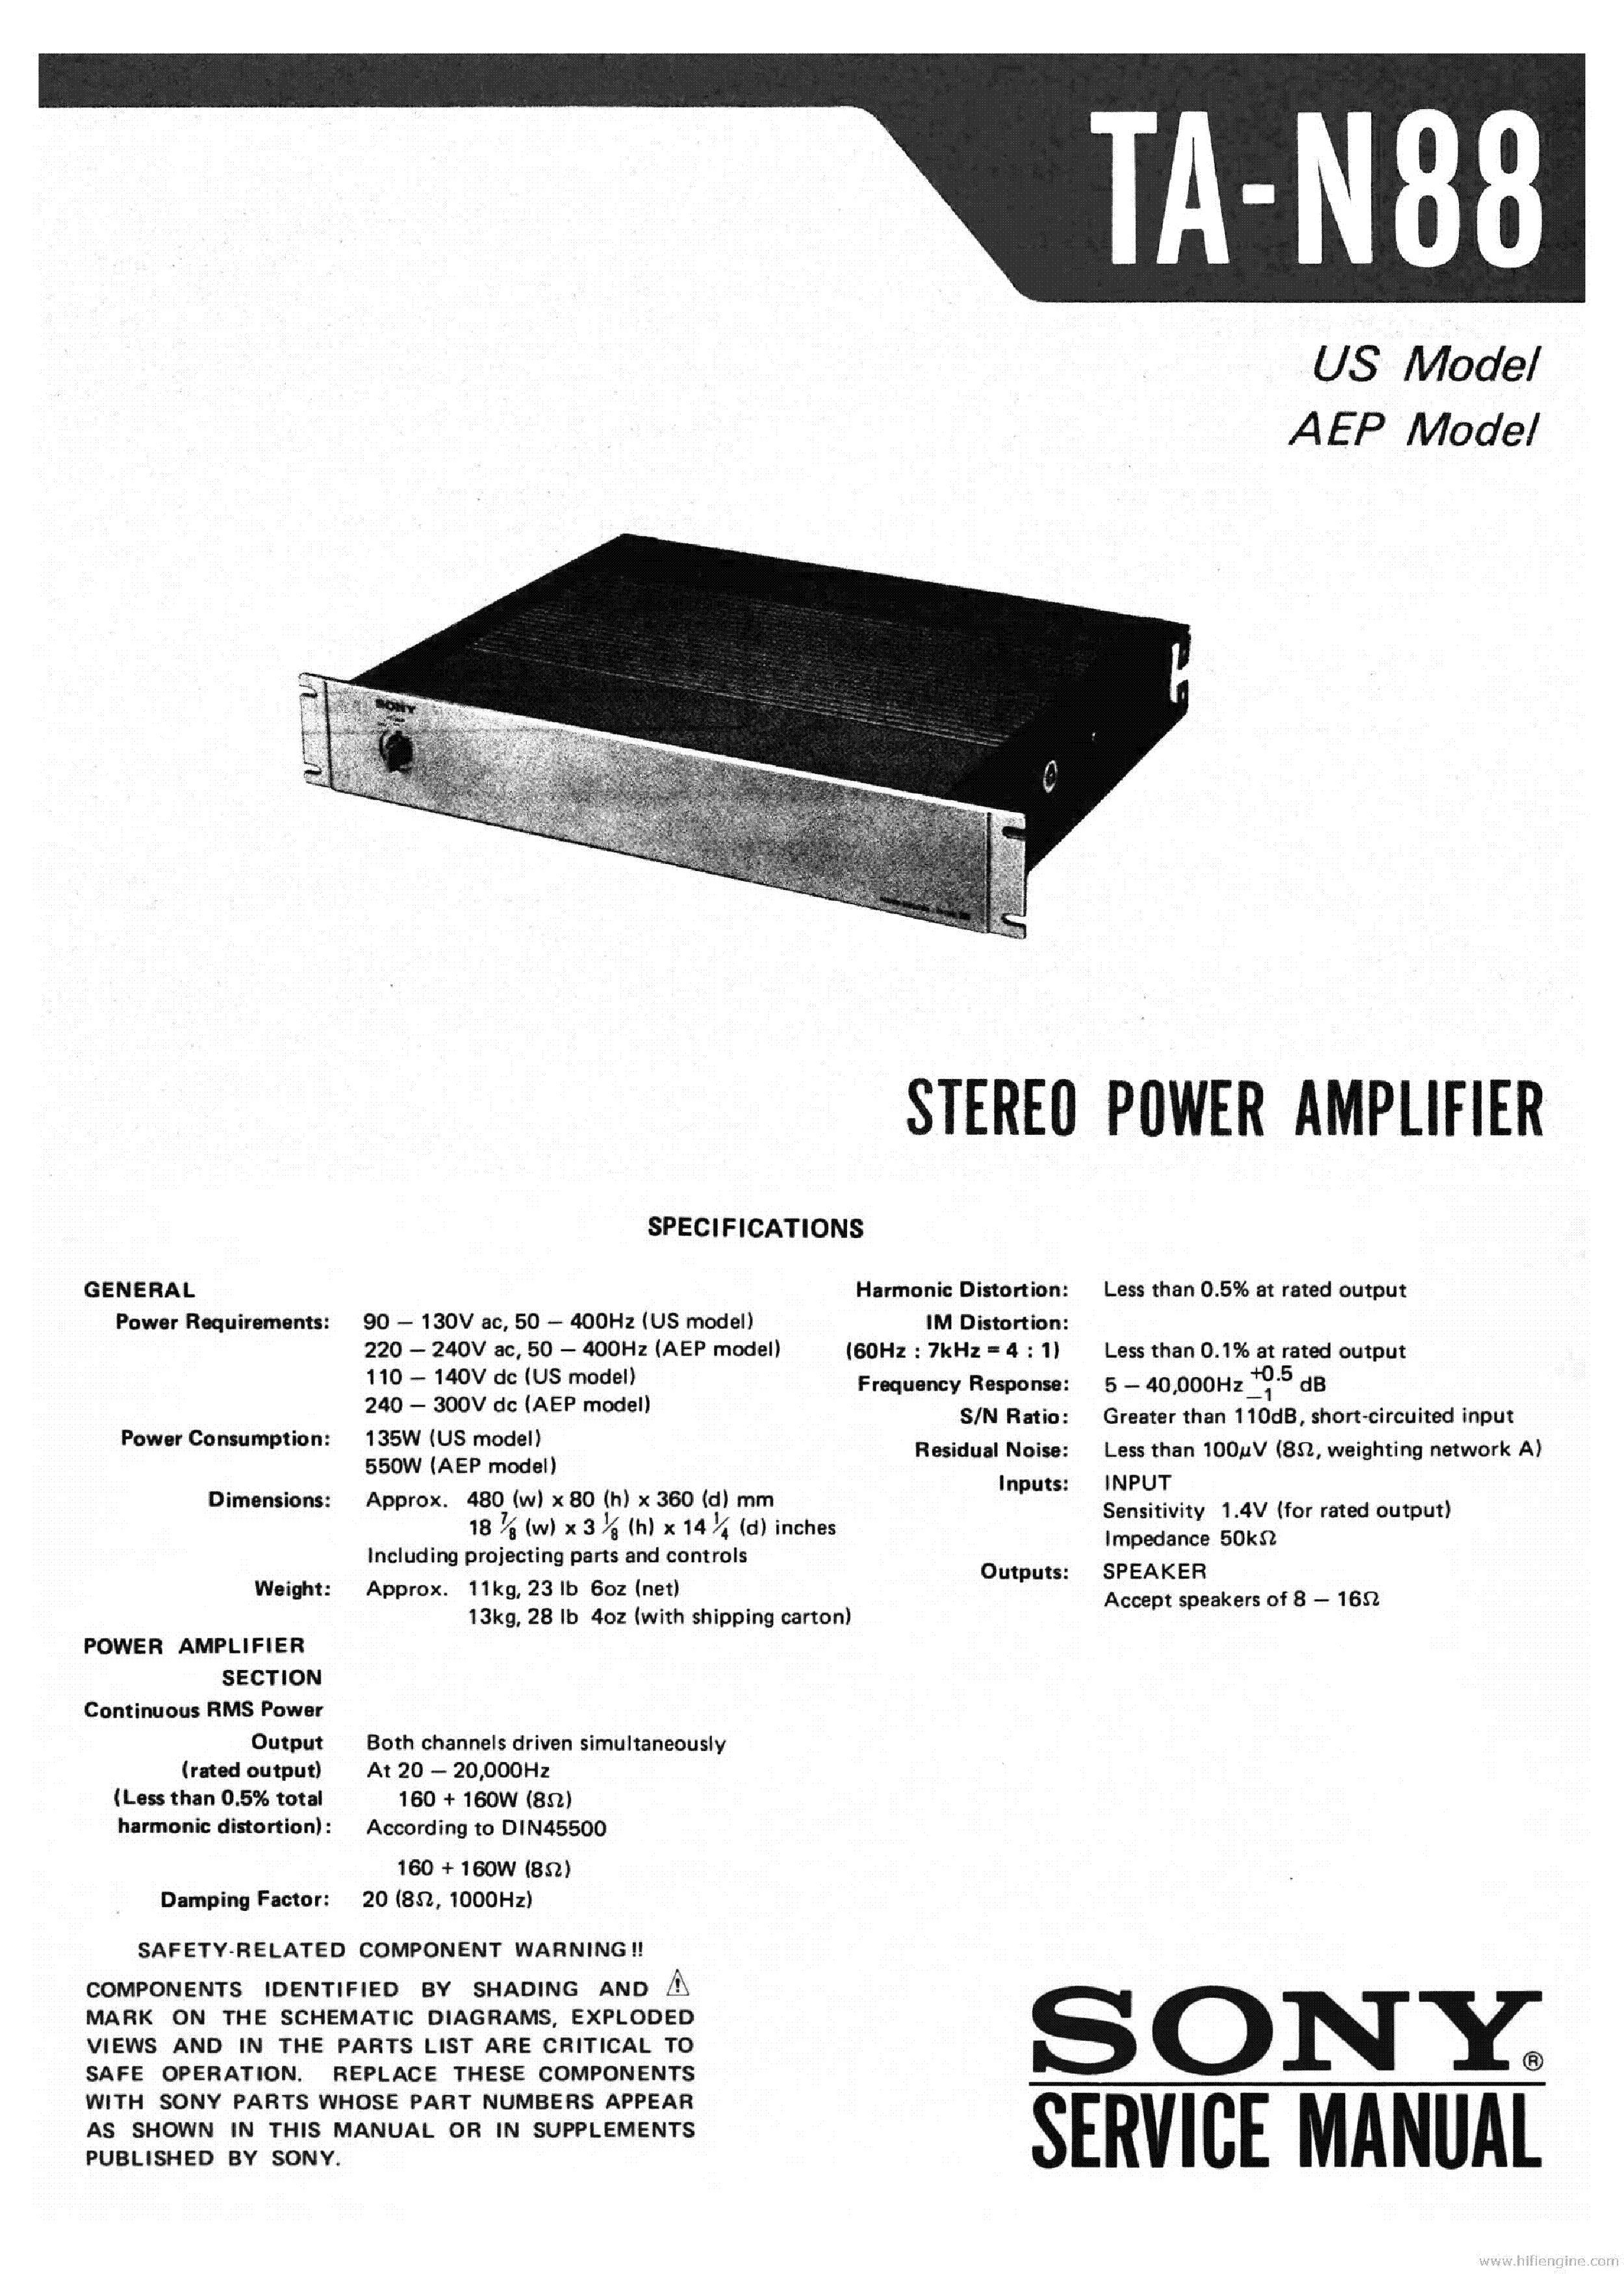 SONY TA-N88 PWRAMP service manual (1st page)